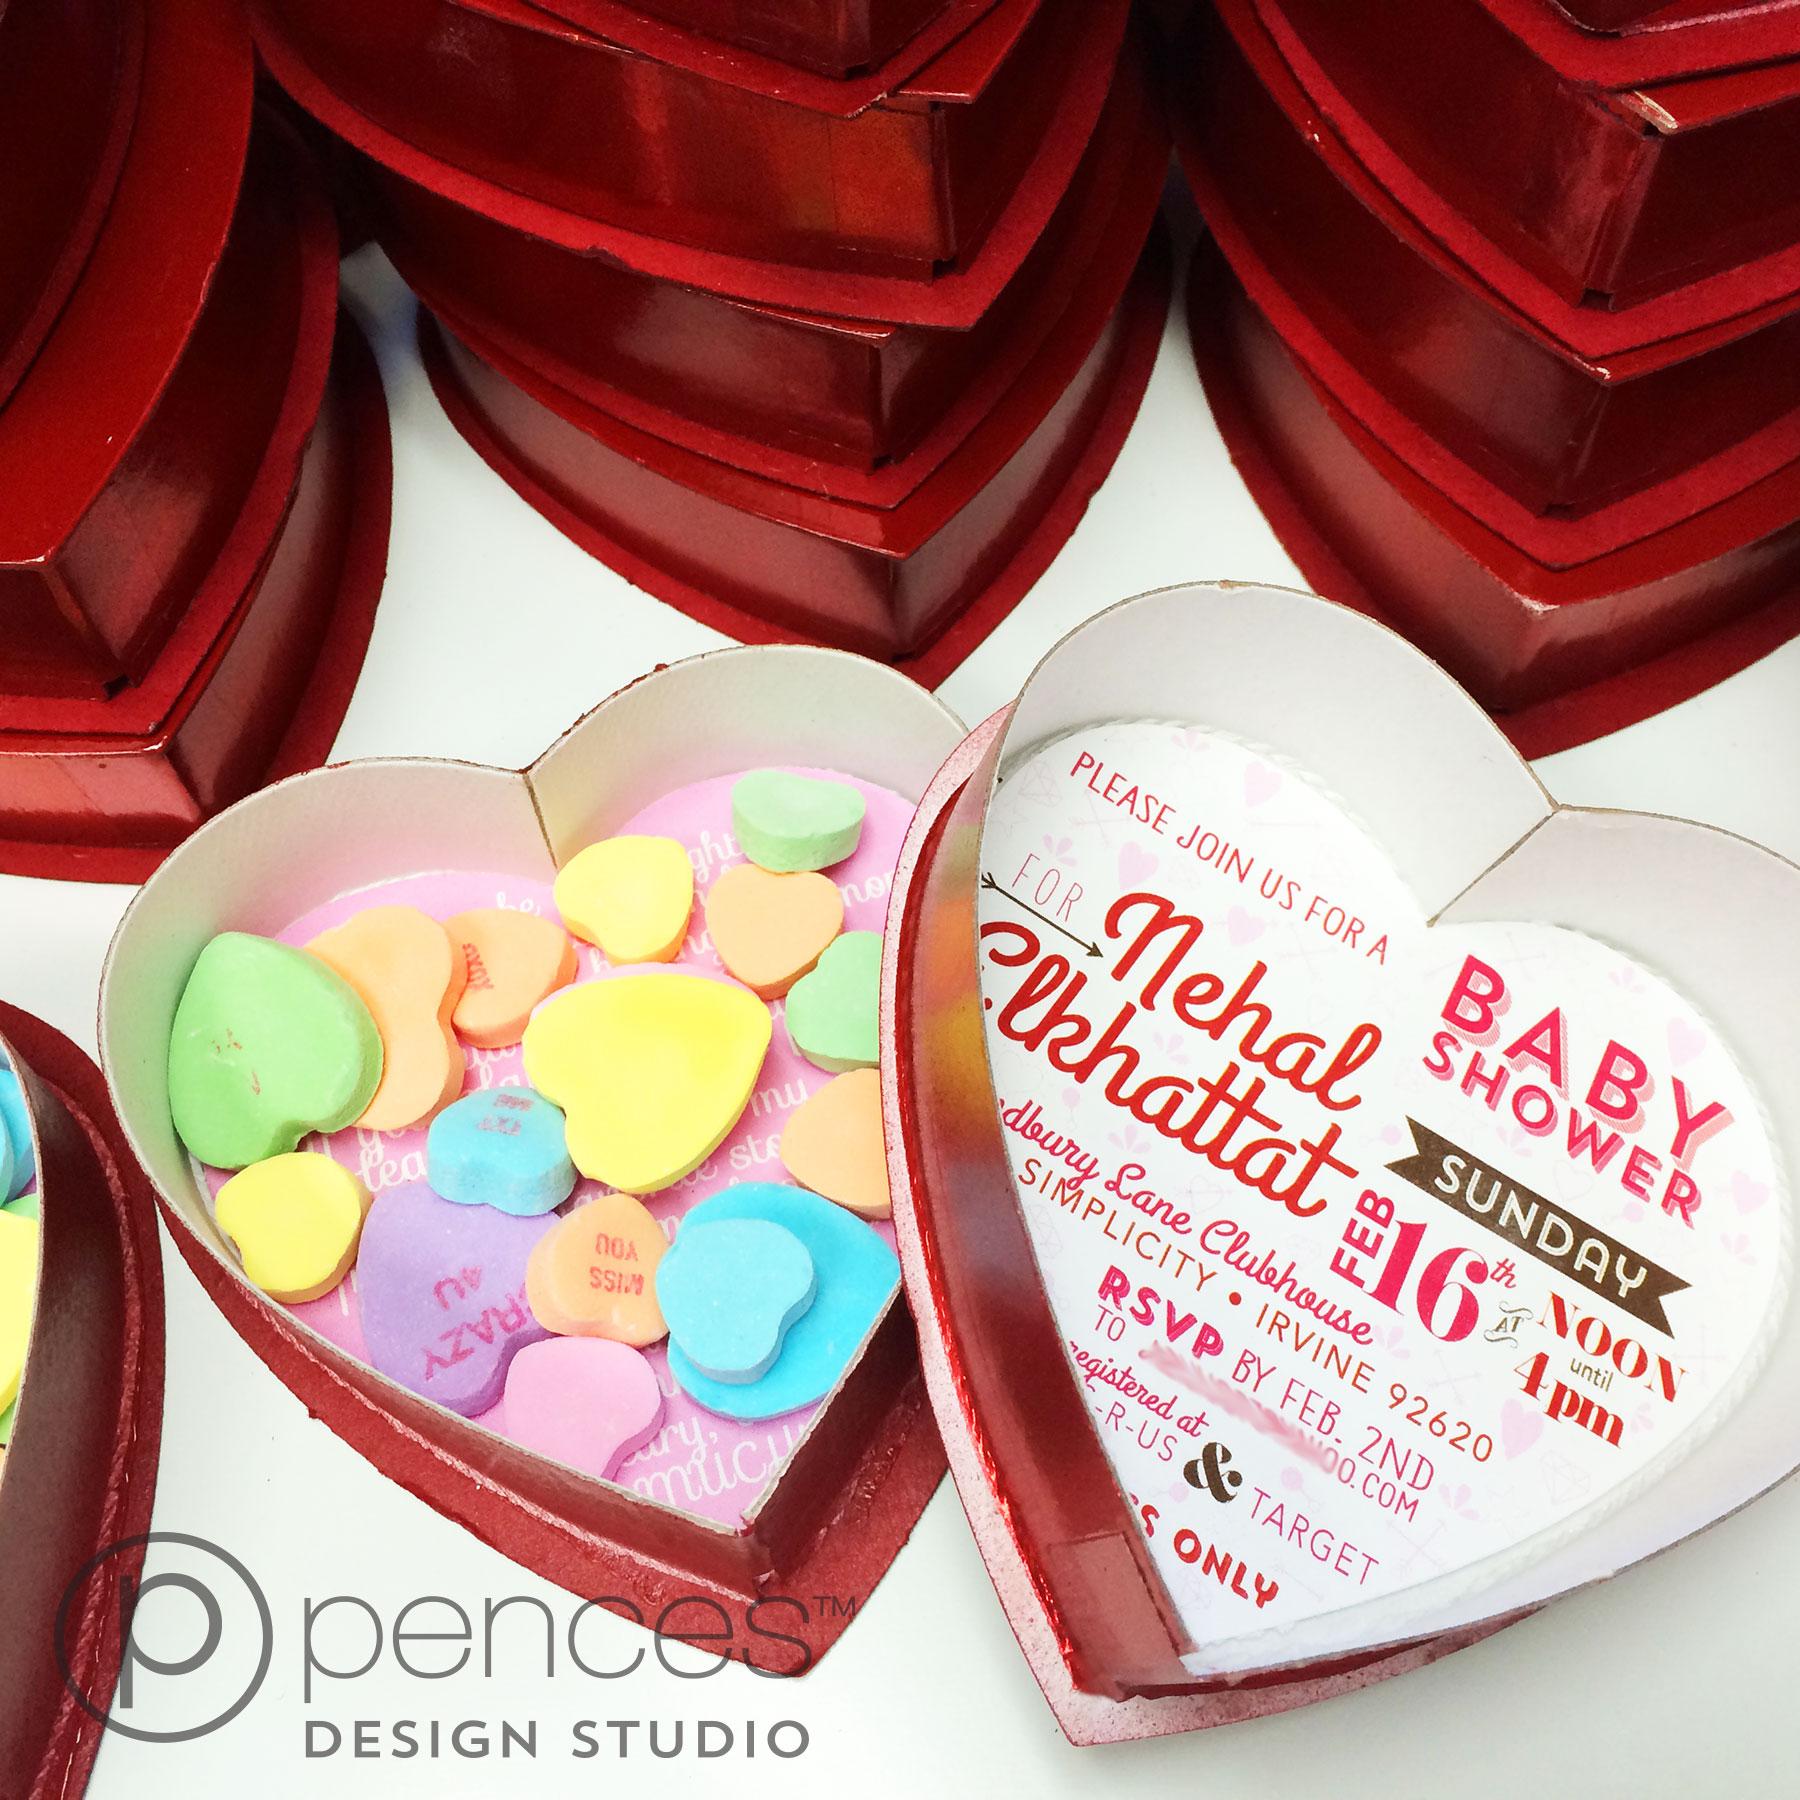 pences-invite30-valentine-babyshower.jpg